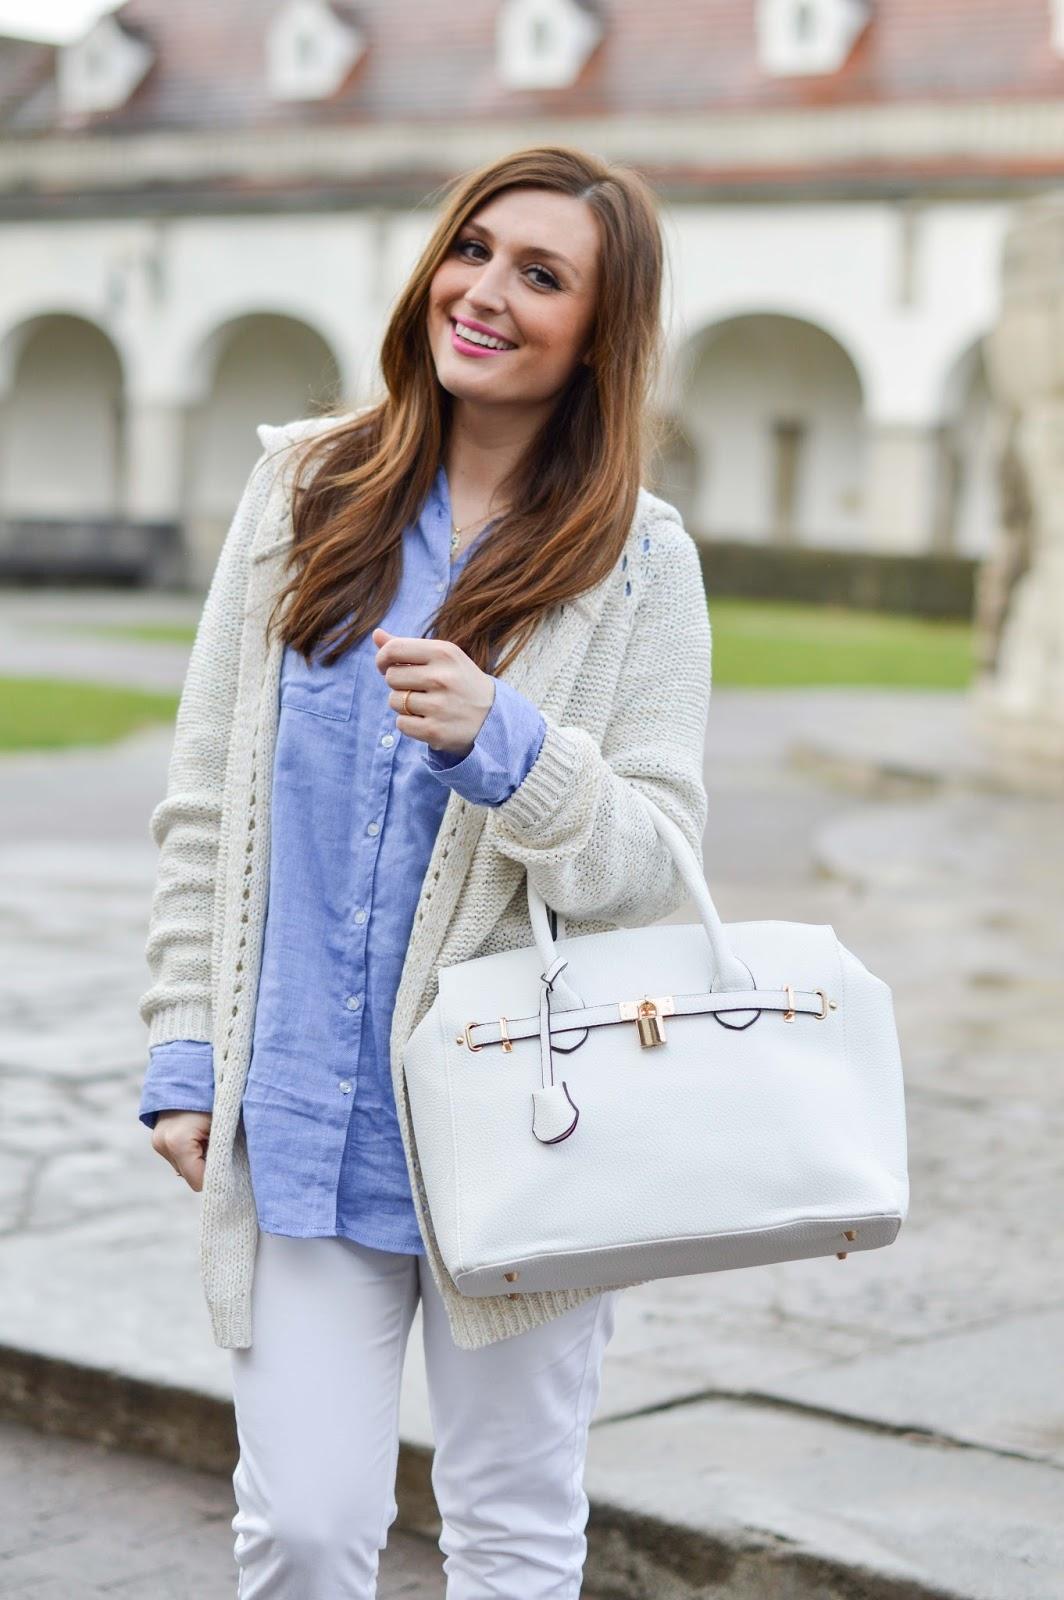 Fashionstylebyjohanna - Frankfurt Fashionblogger - Outfitinspiration Fashionblogger - Weiße Hose - Weiße Tasche - Just Fab - My Colloseum